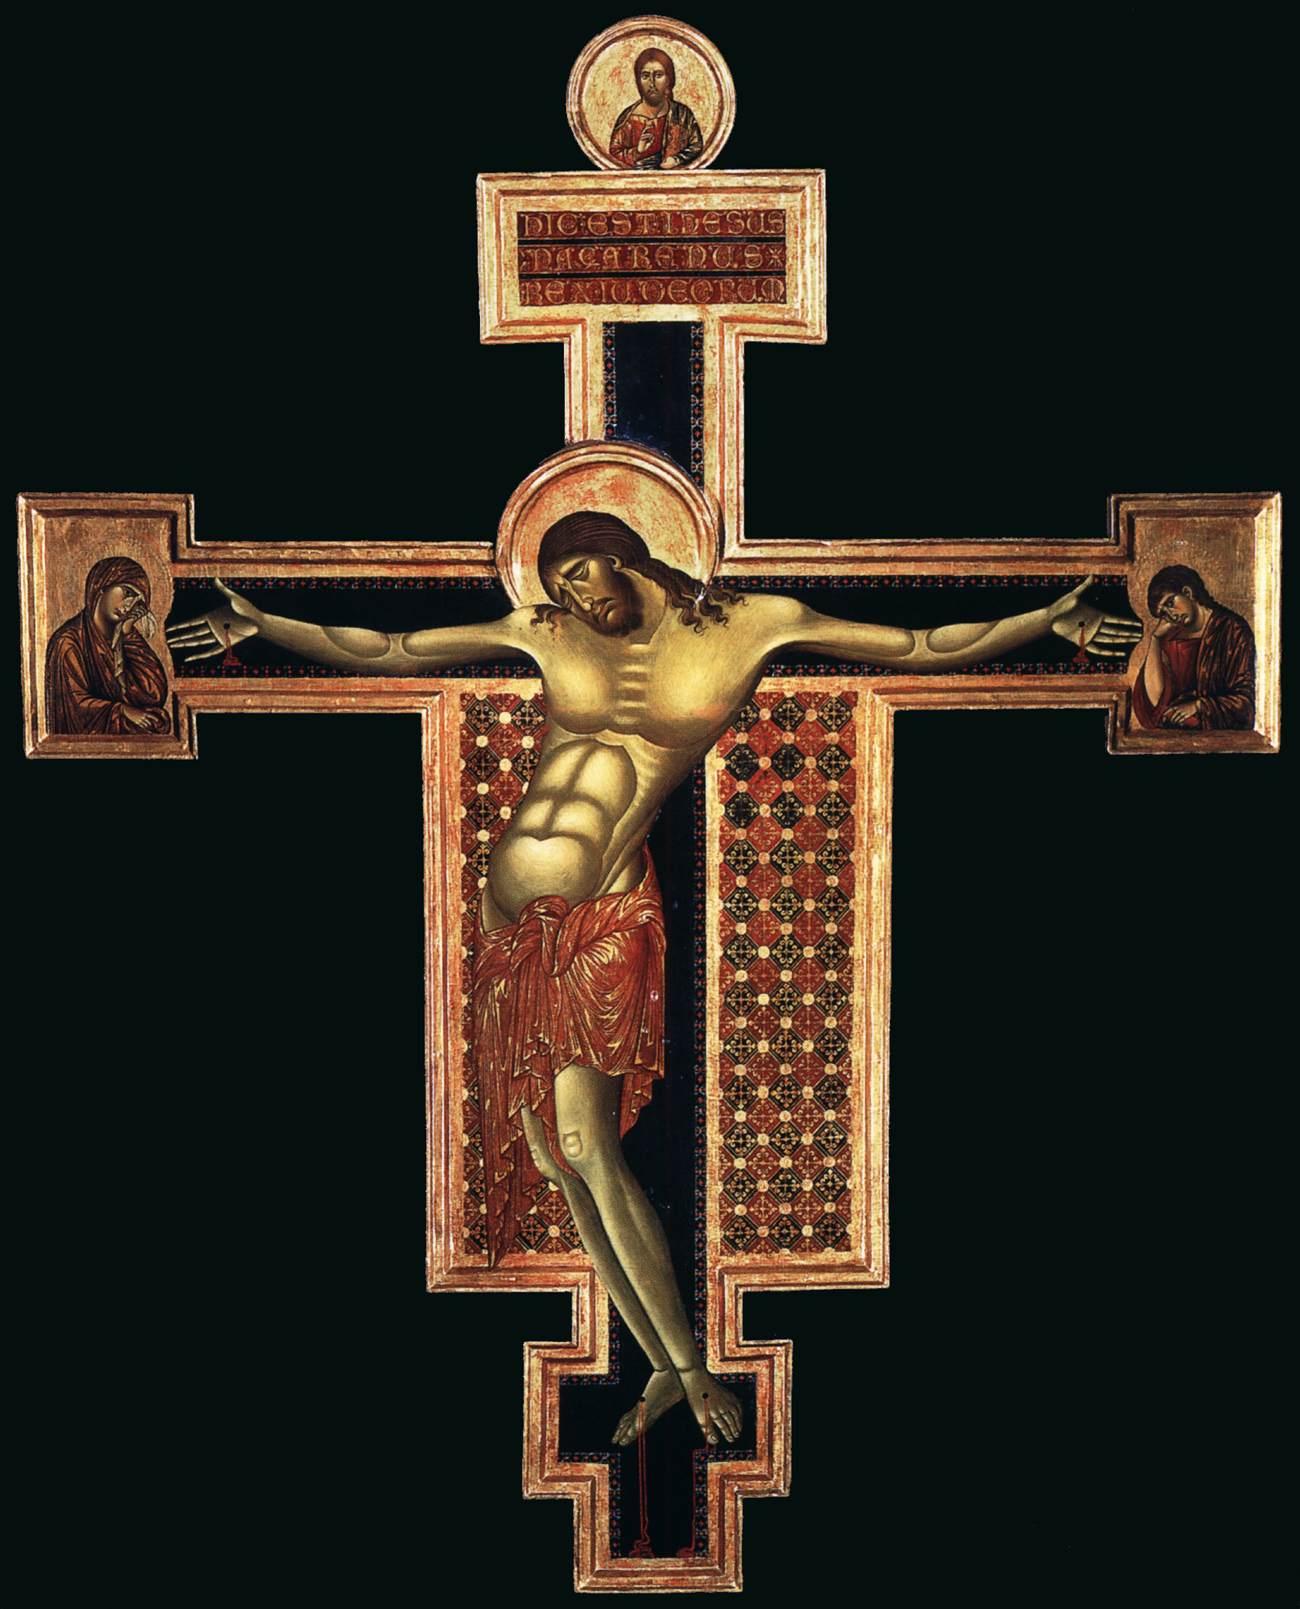 170414 Image 3 - Cimabue Crucifix.jpg